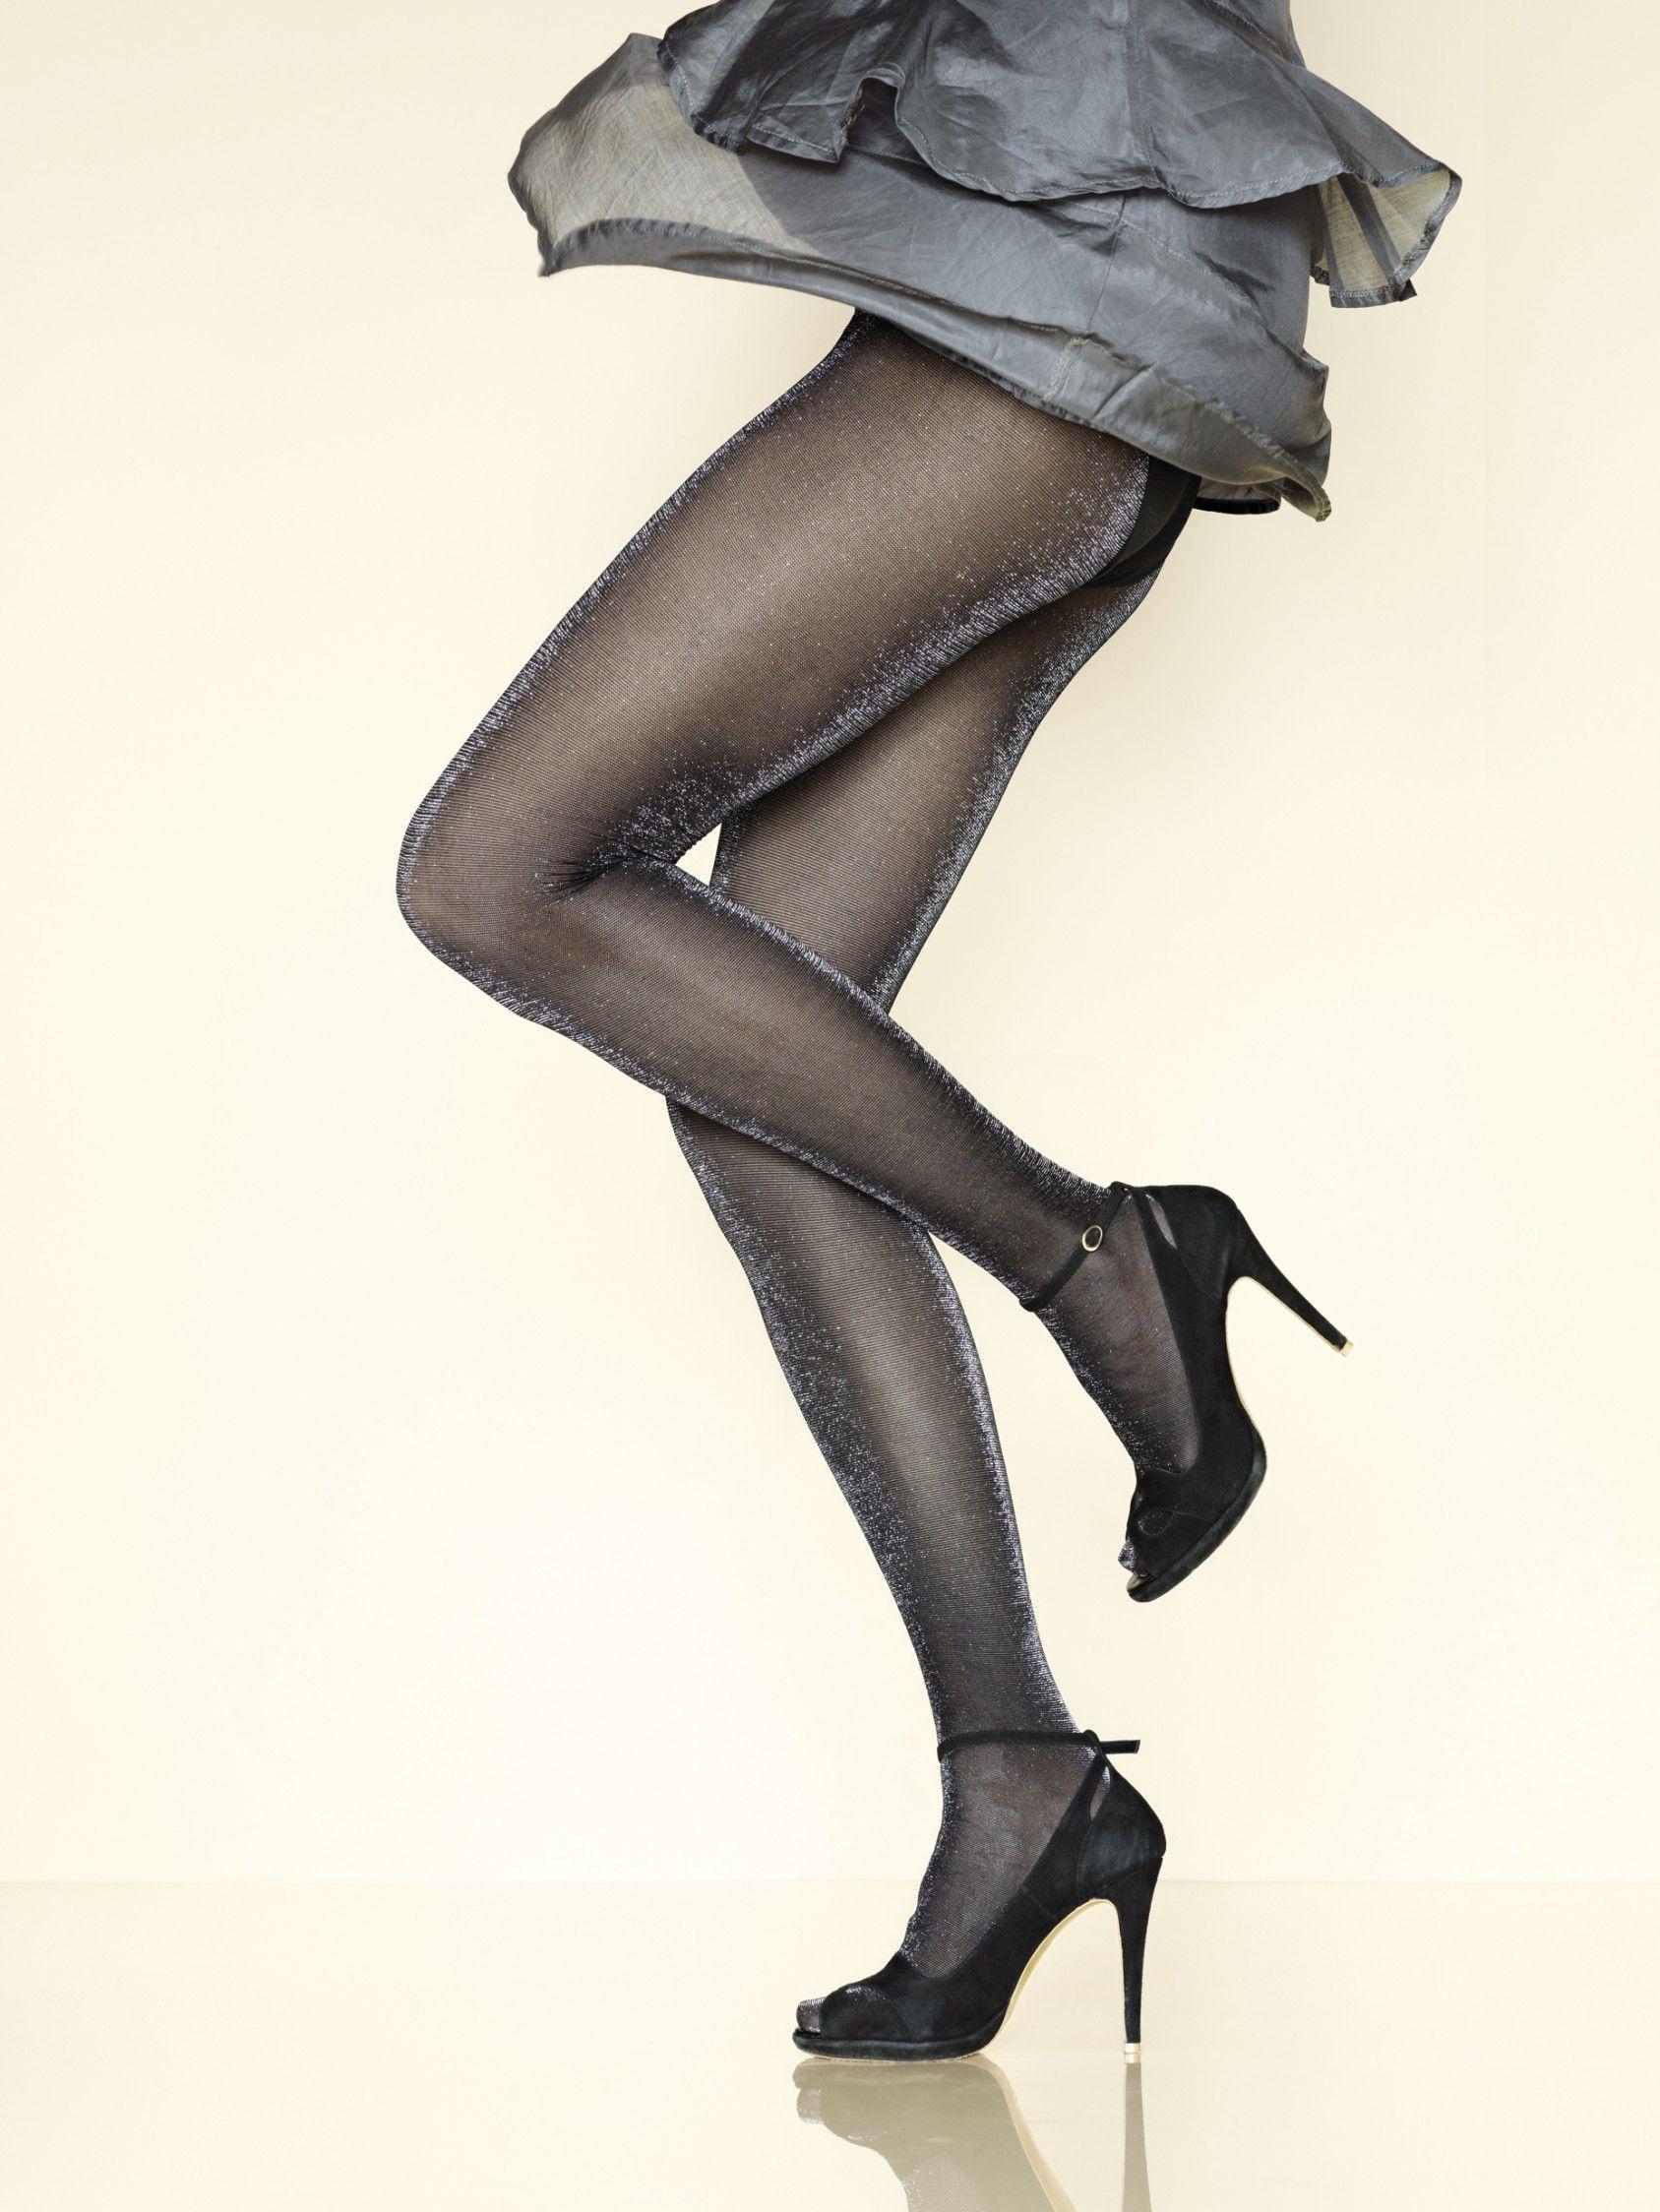 collant opaque shhrazade noir argent de chez gerbe with collant opaque noir 561d76594e0